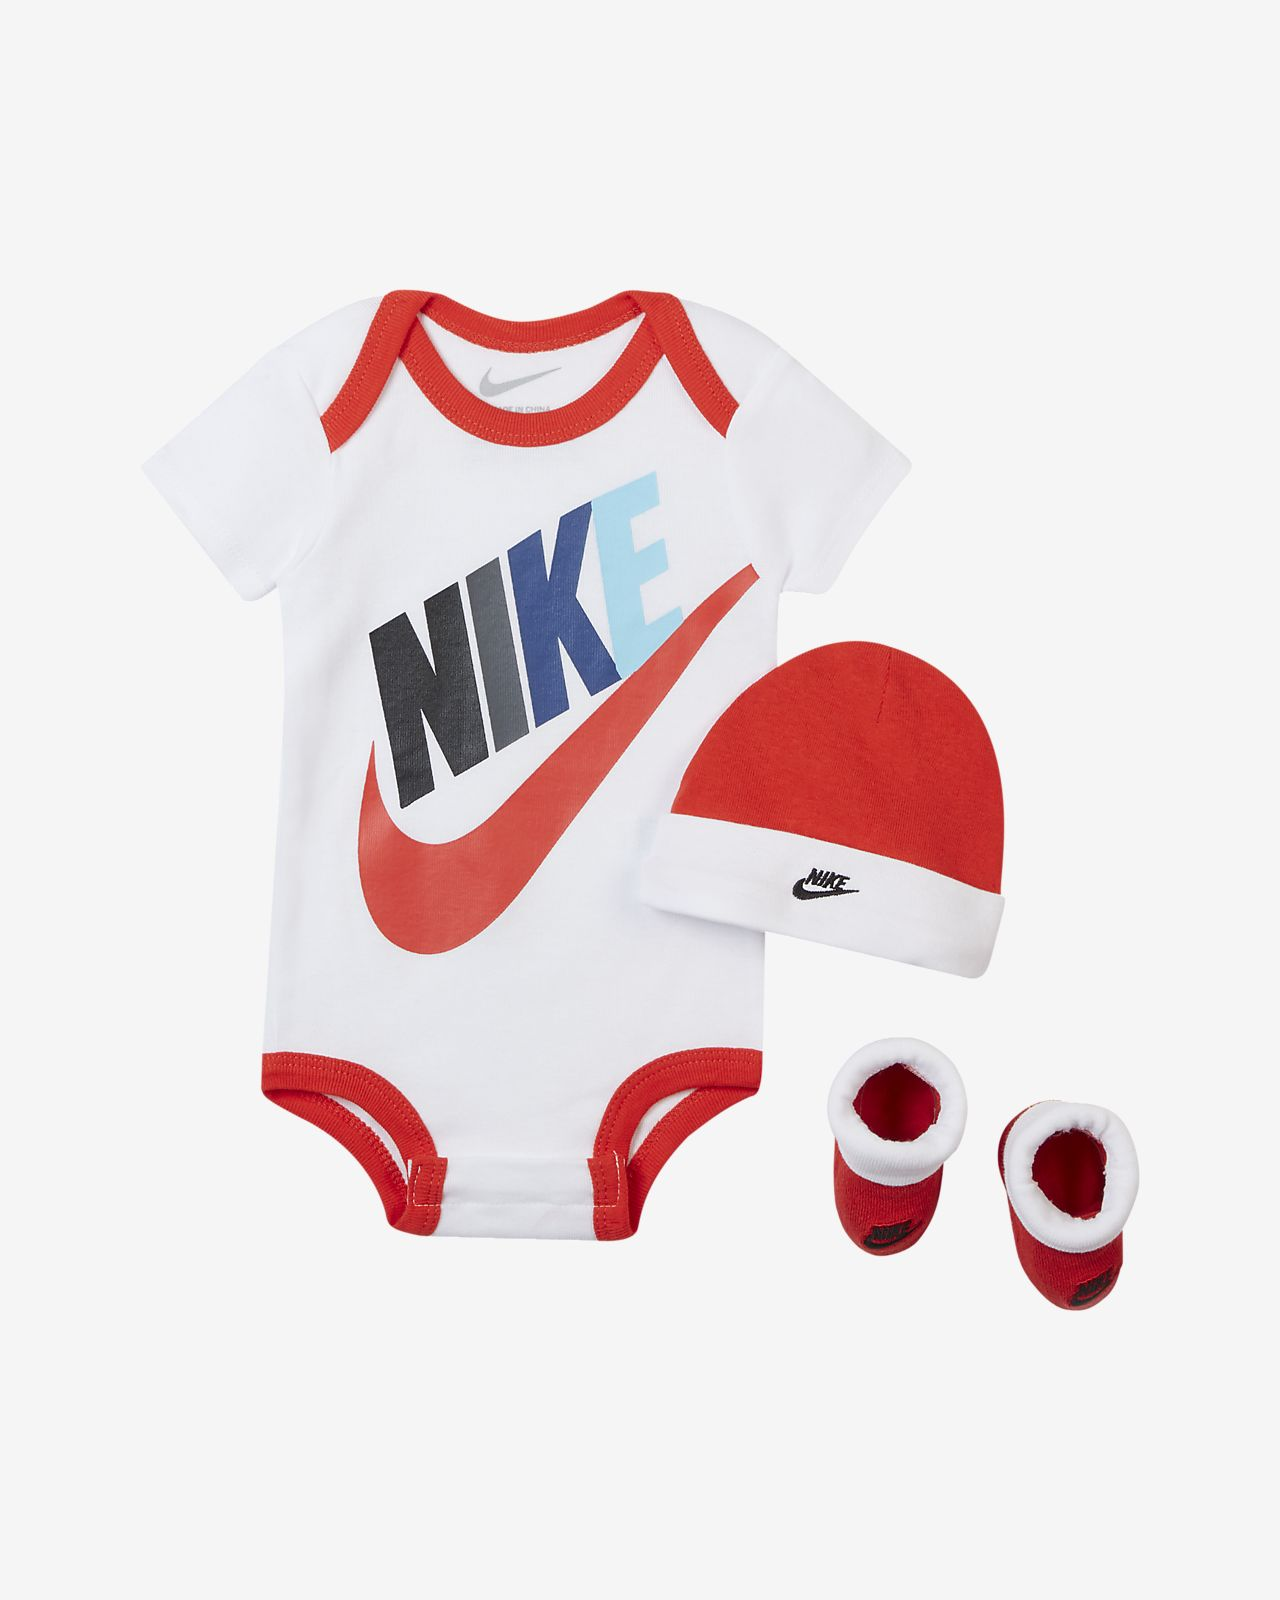 new product a22b3 51fa3 Nike Sportswear Baby 3-Piece Set. Nike.com